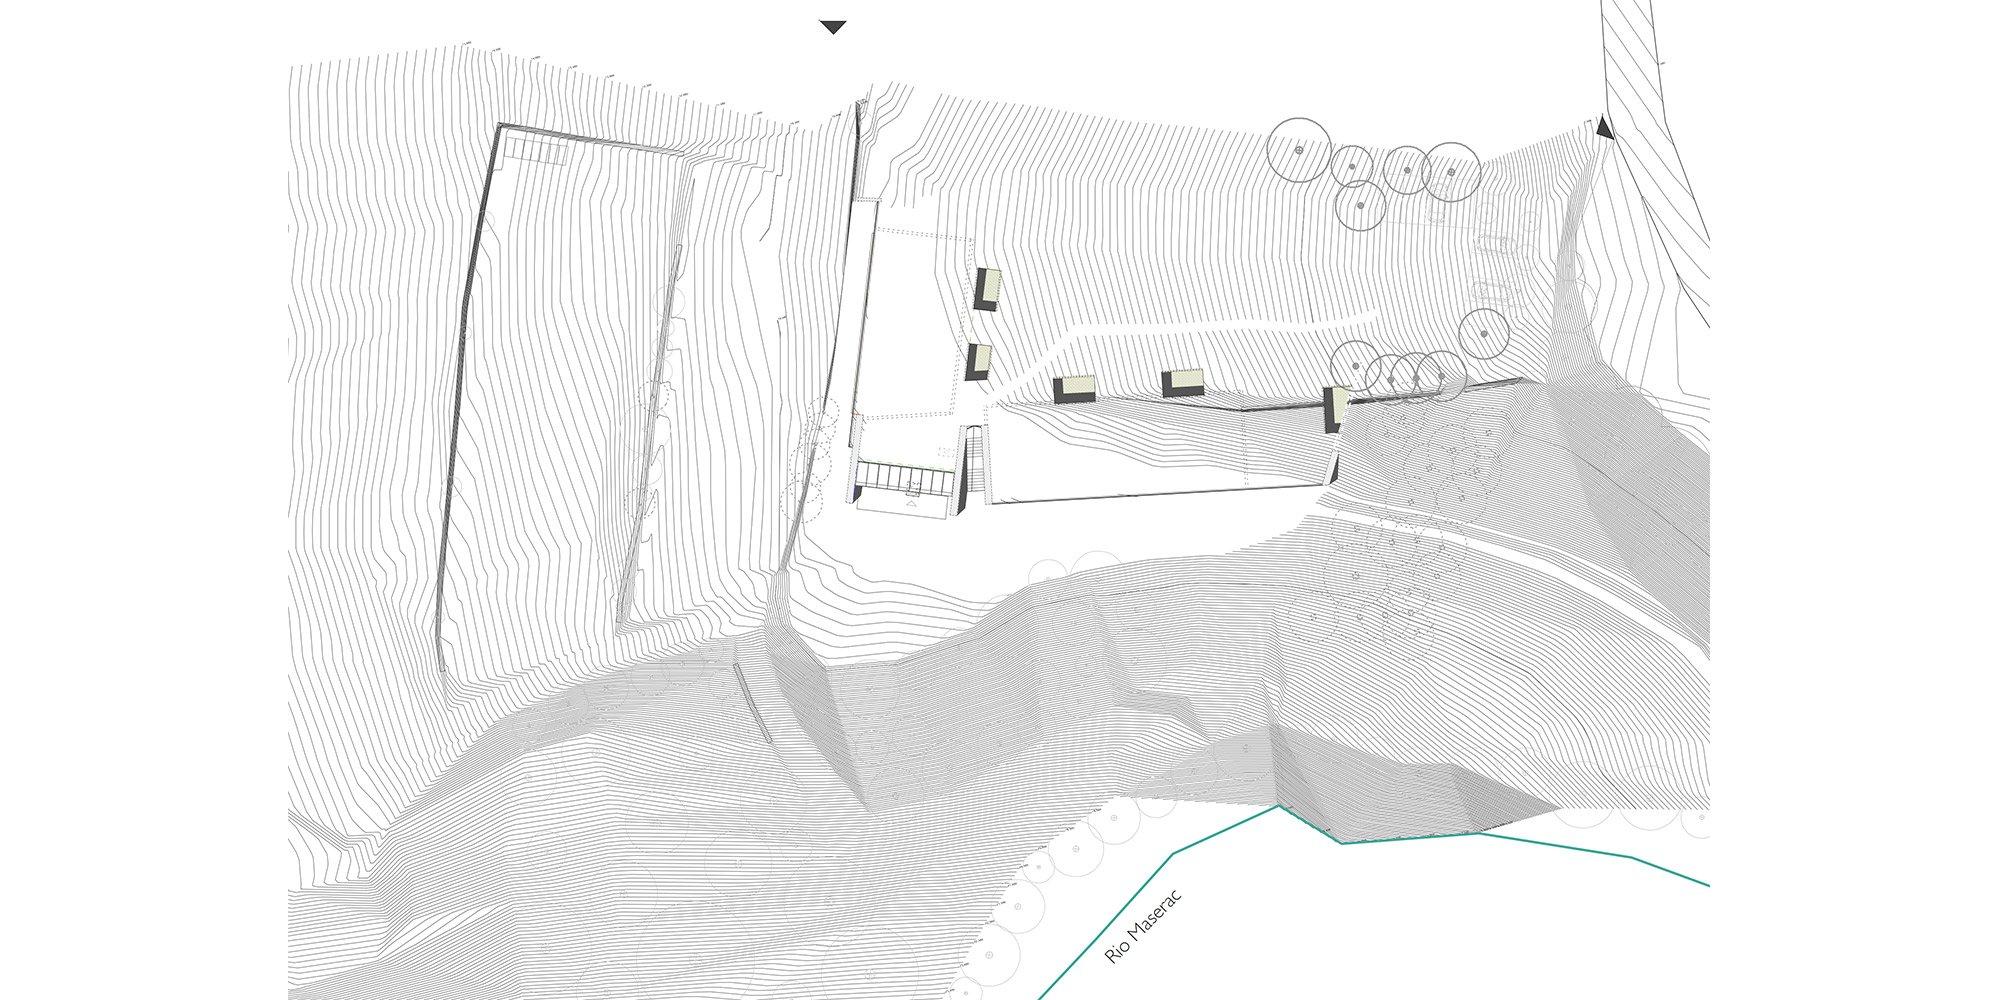 Planimetria © Stefania Saracino e Franco Tagliabue Architetti